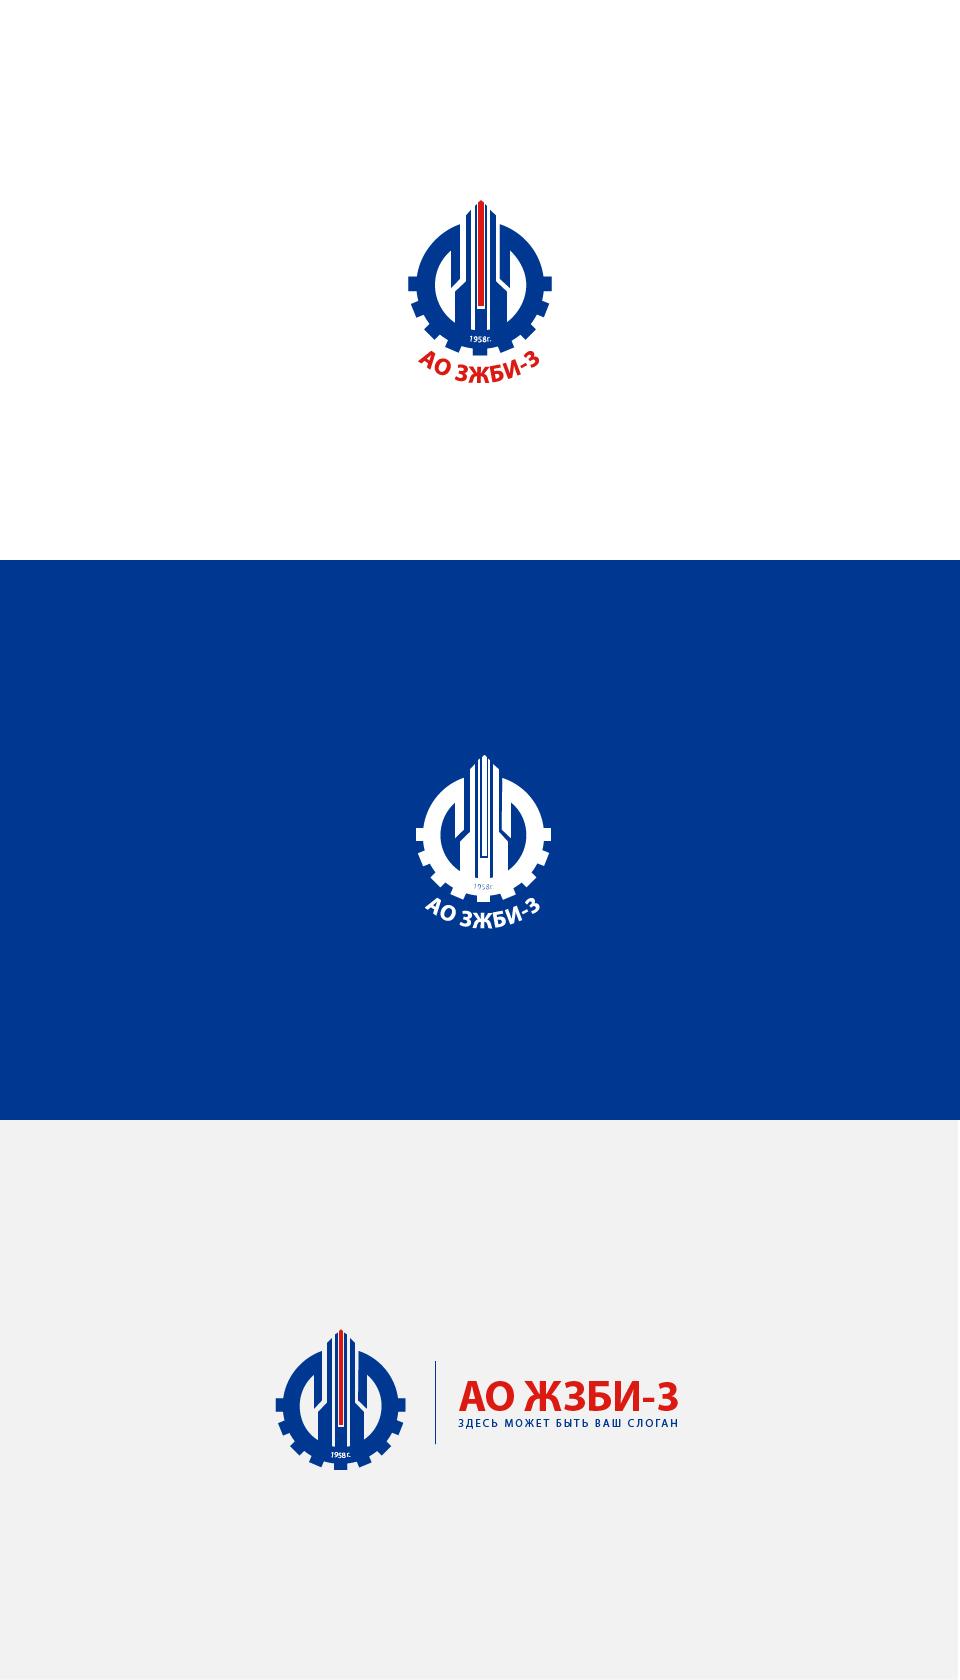 Разработка логотипа и фирменный стиль фото f_166596fbe9772faa.jpg